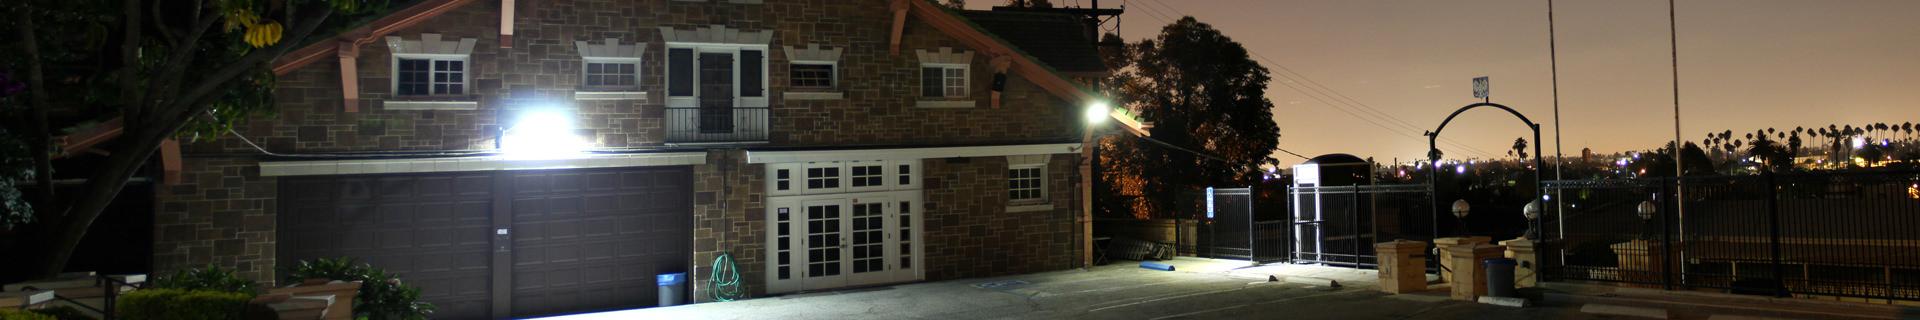 Led wall pack lights agc lighting led wall pack lights aloadofball Choice Image